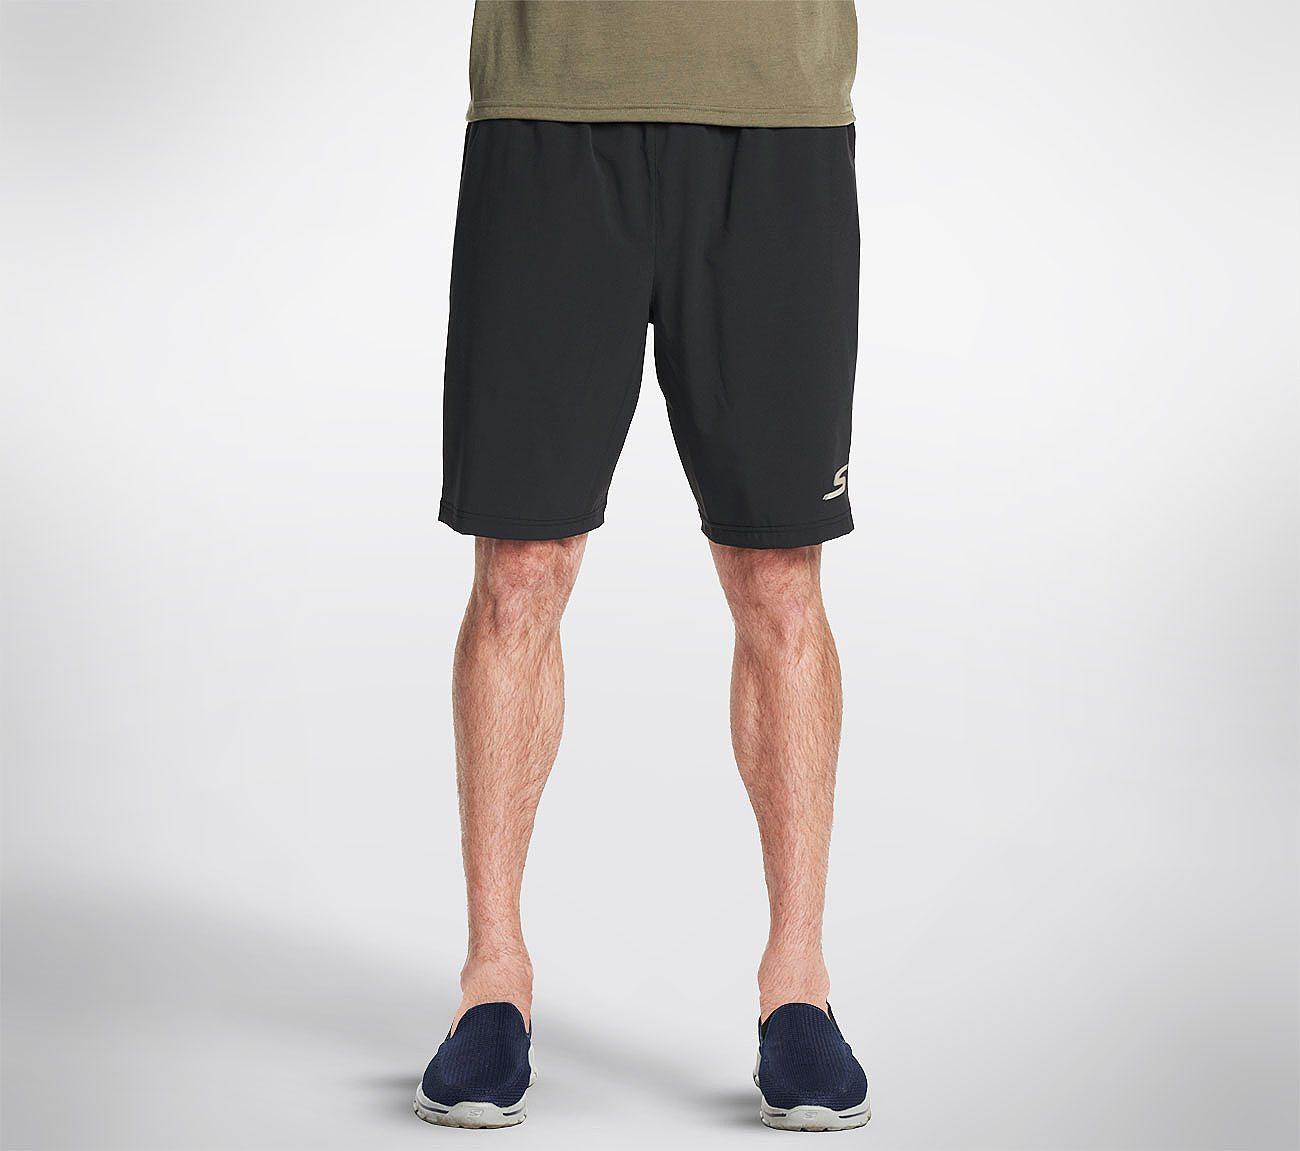 Critical Angle Shorts